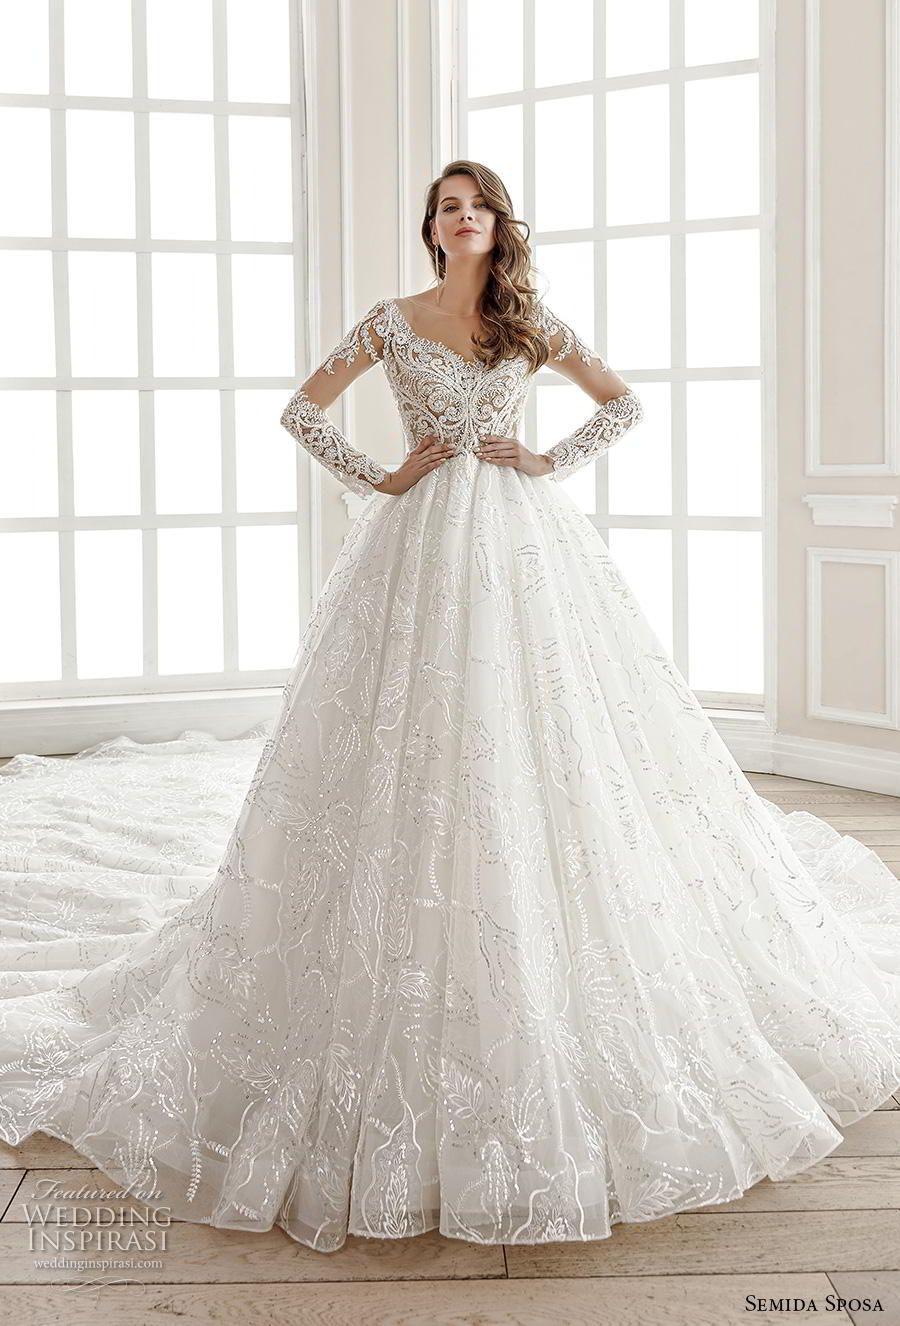 Semida Sposa 2020 Wedding Dresses Amazon Bridal Collection Wedding Inspirasi Wedding Dresses Amazon Wedding Dresses Beaded Wedding Dress Accessories